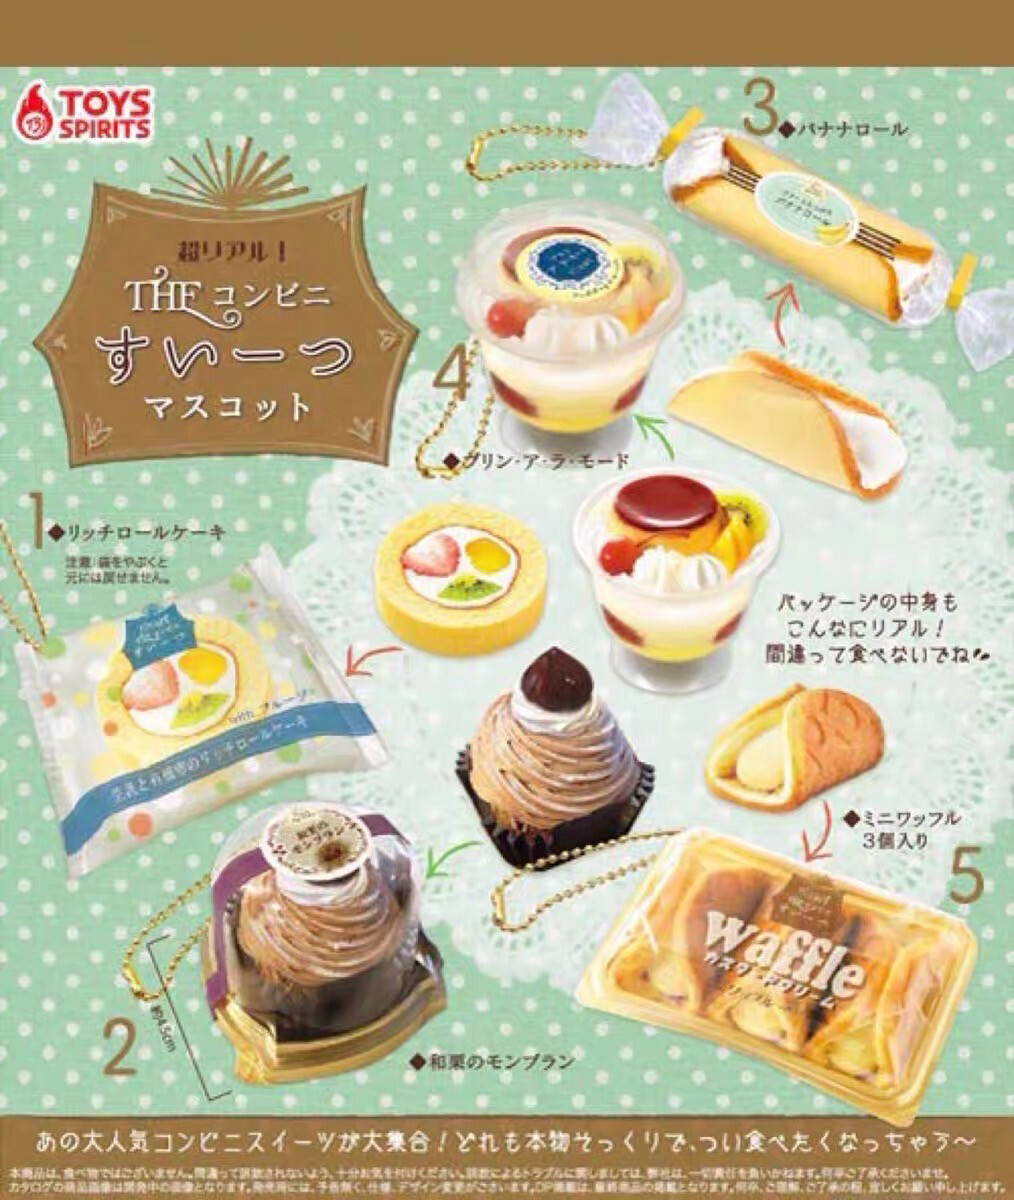 Toys Spirits Convenience Shop Dessert Miniature